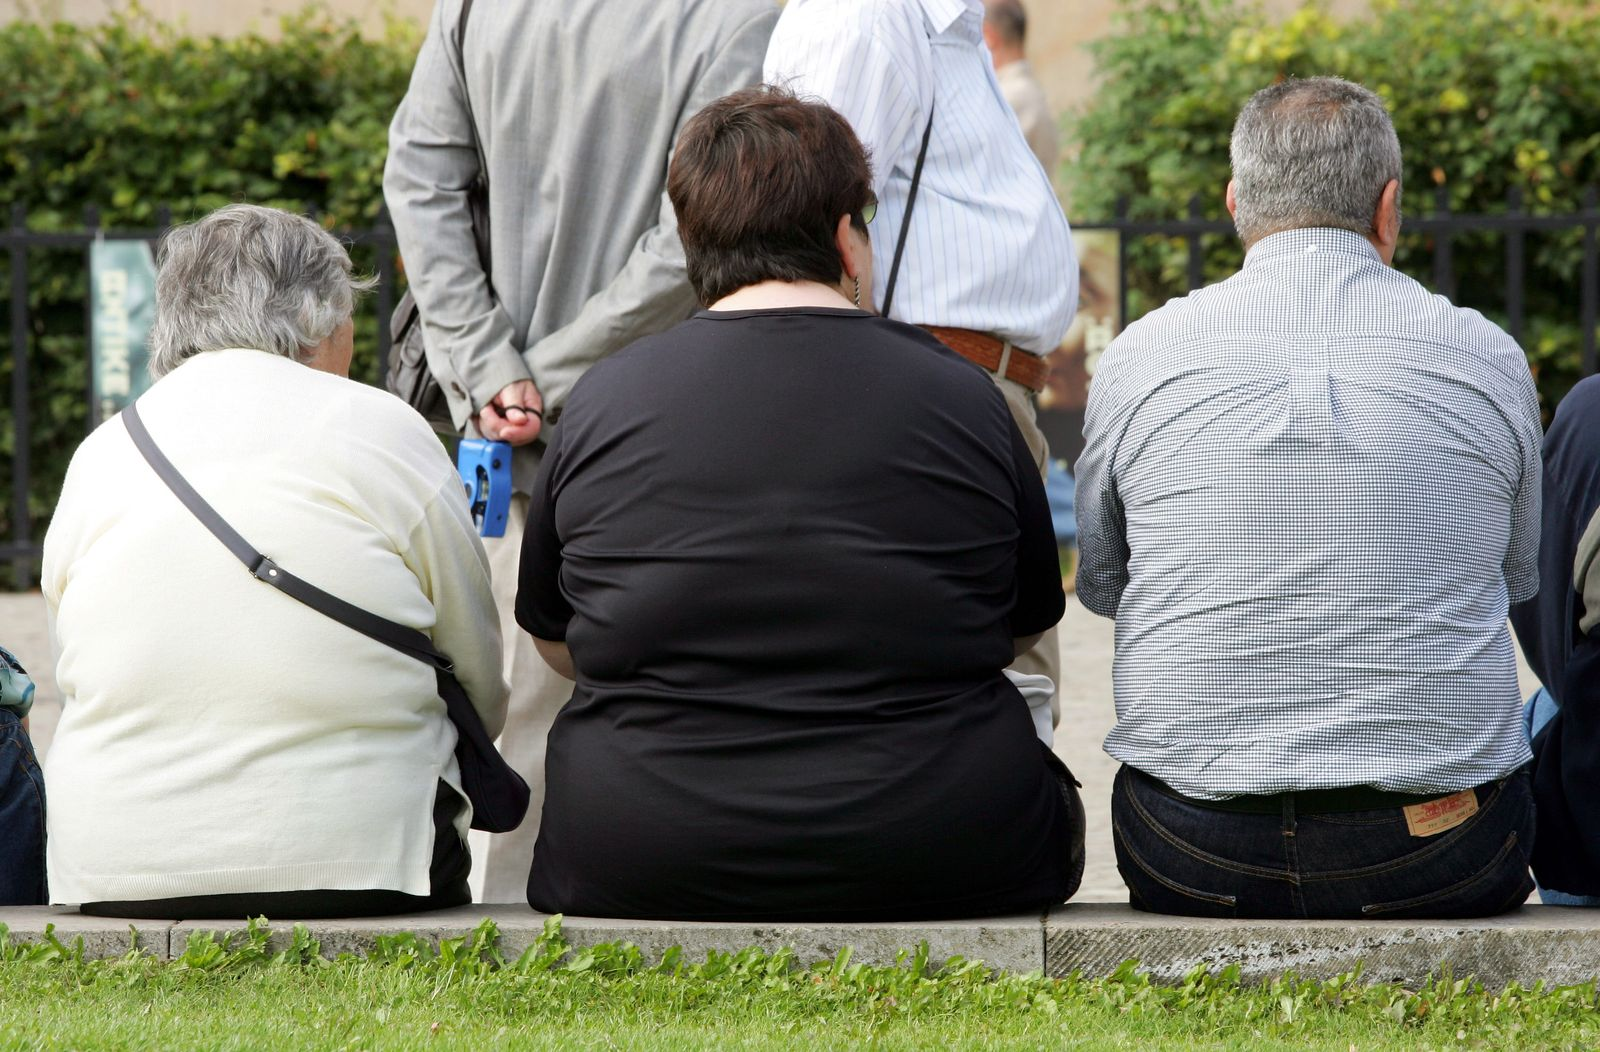 Übergewicht / Adipositas